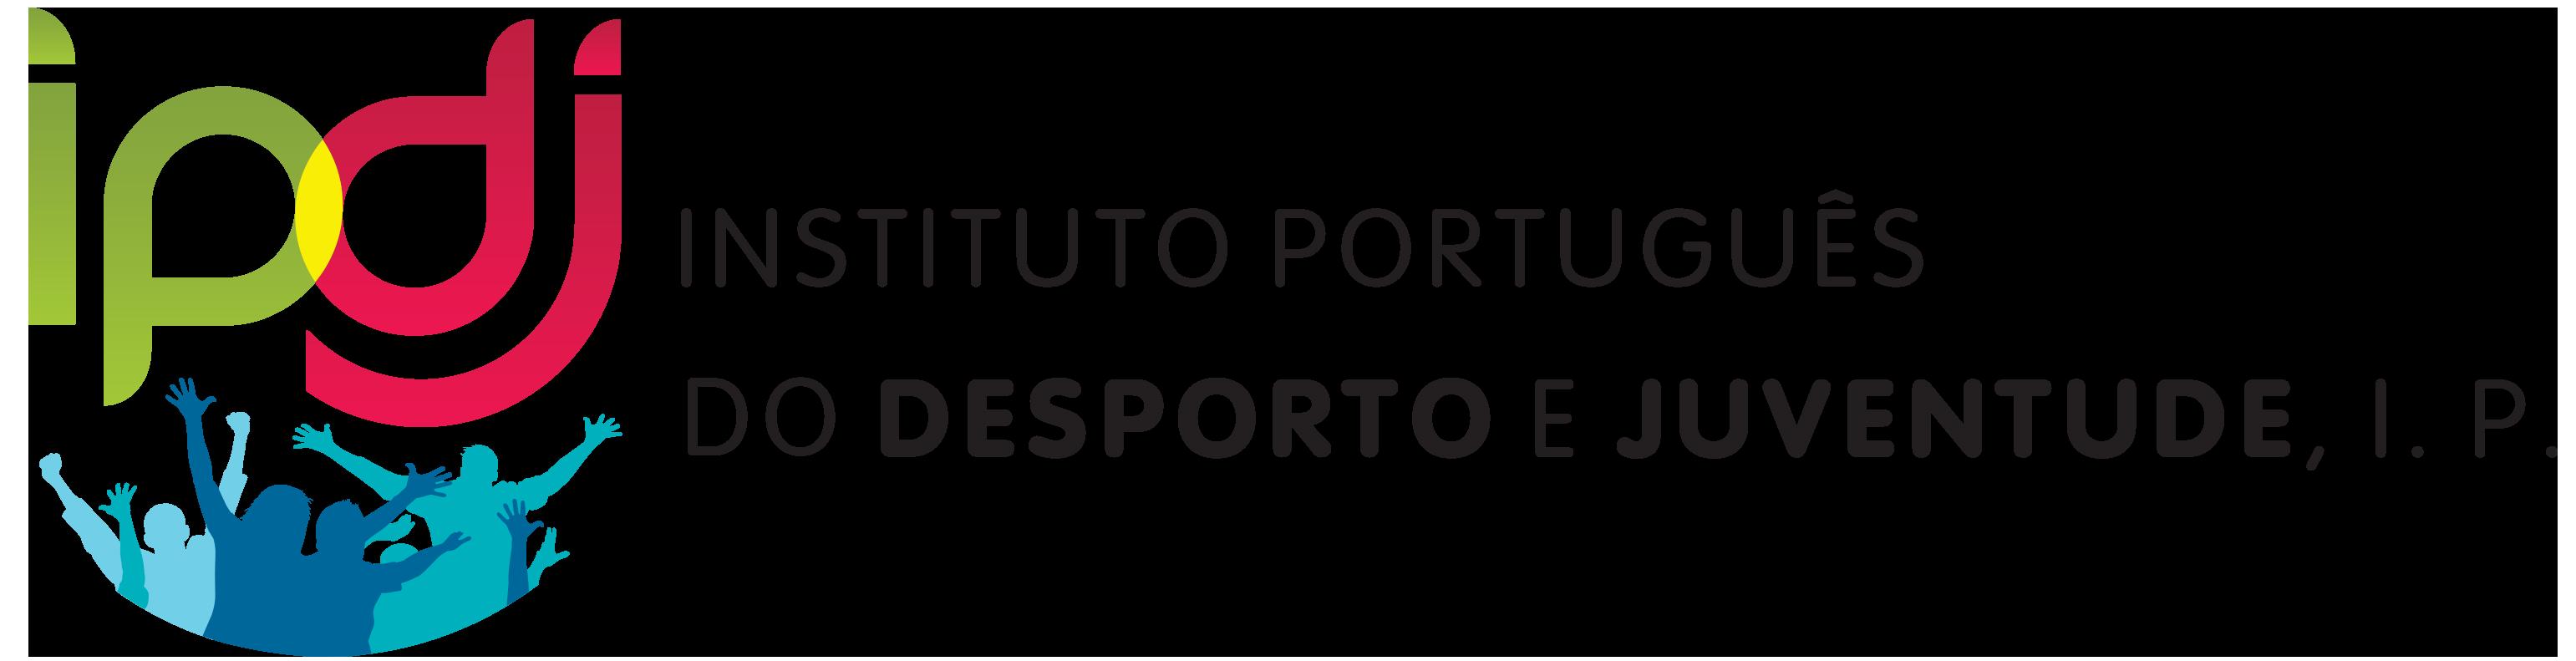 Logo IPDJ Horizontal Cores